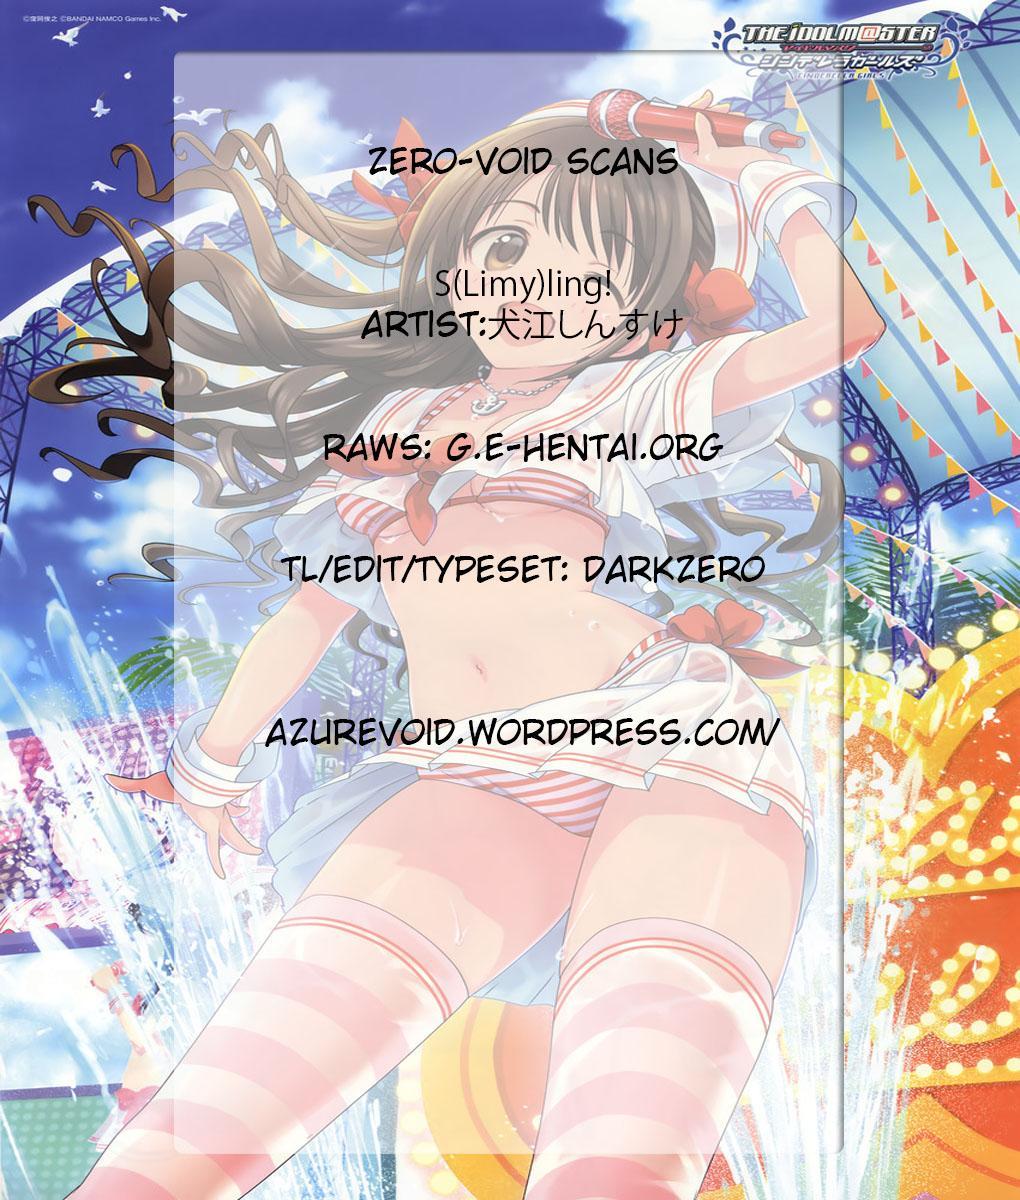 (C89) [Jingai Makyou (Inue Shinsuke)] S(Limy)ing! (THE iDOLM@STER CINDERELLA GIRLS) [English] [ZERO-VOID] 31